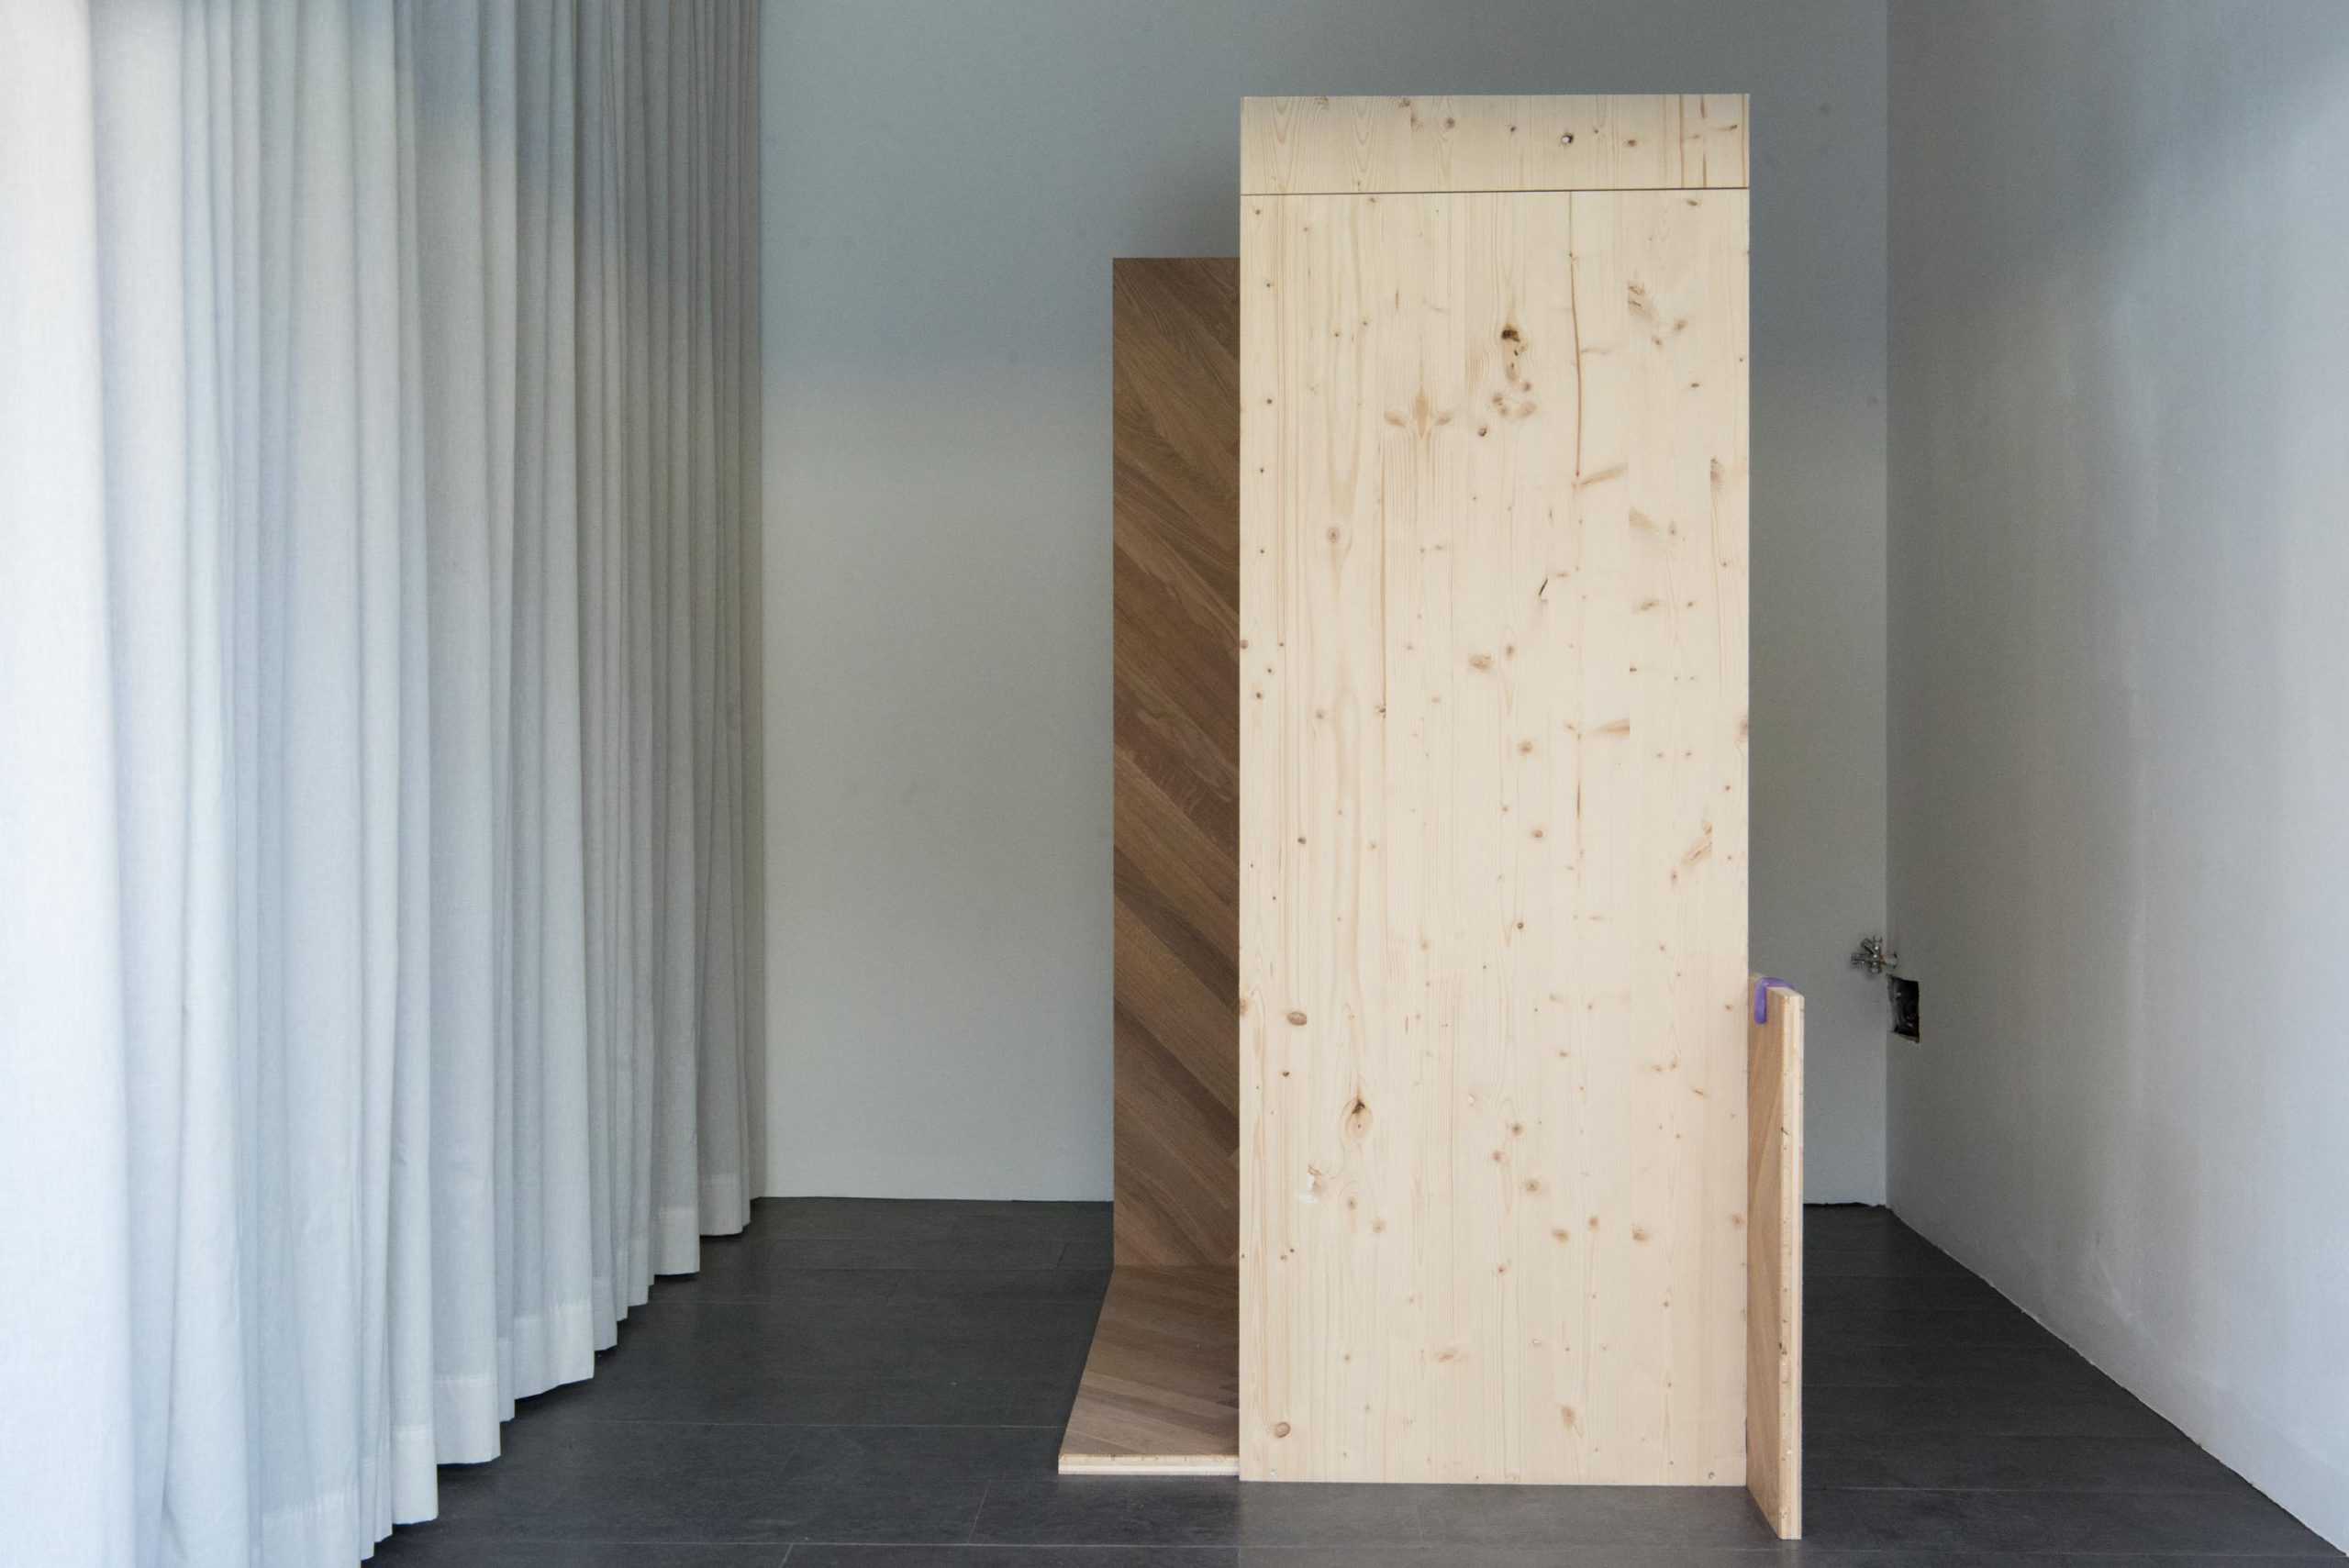 floor-work_Luka-Jana-Berchtold_2021_cSusanne-Reiterer-24